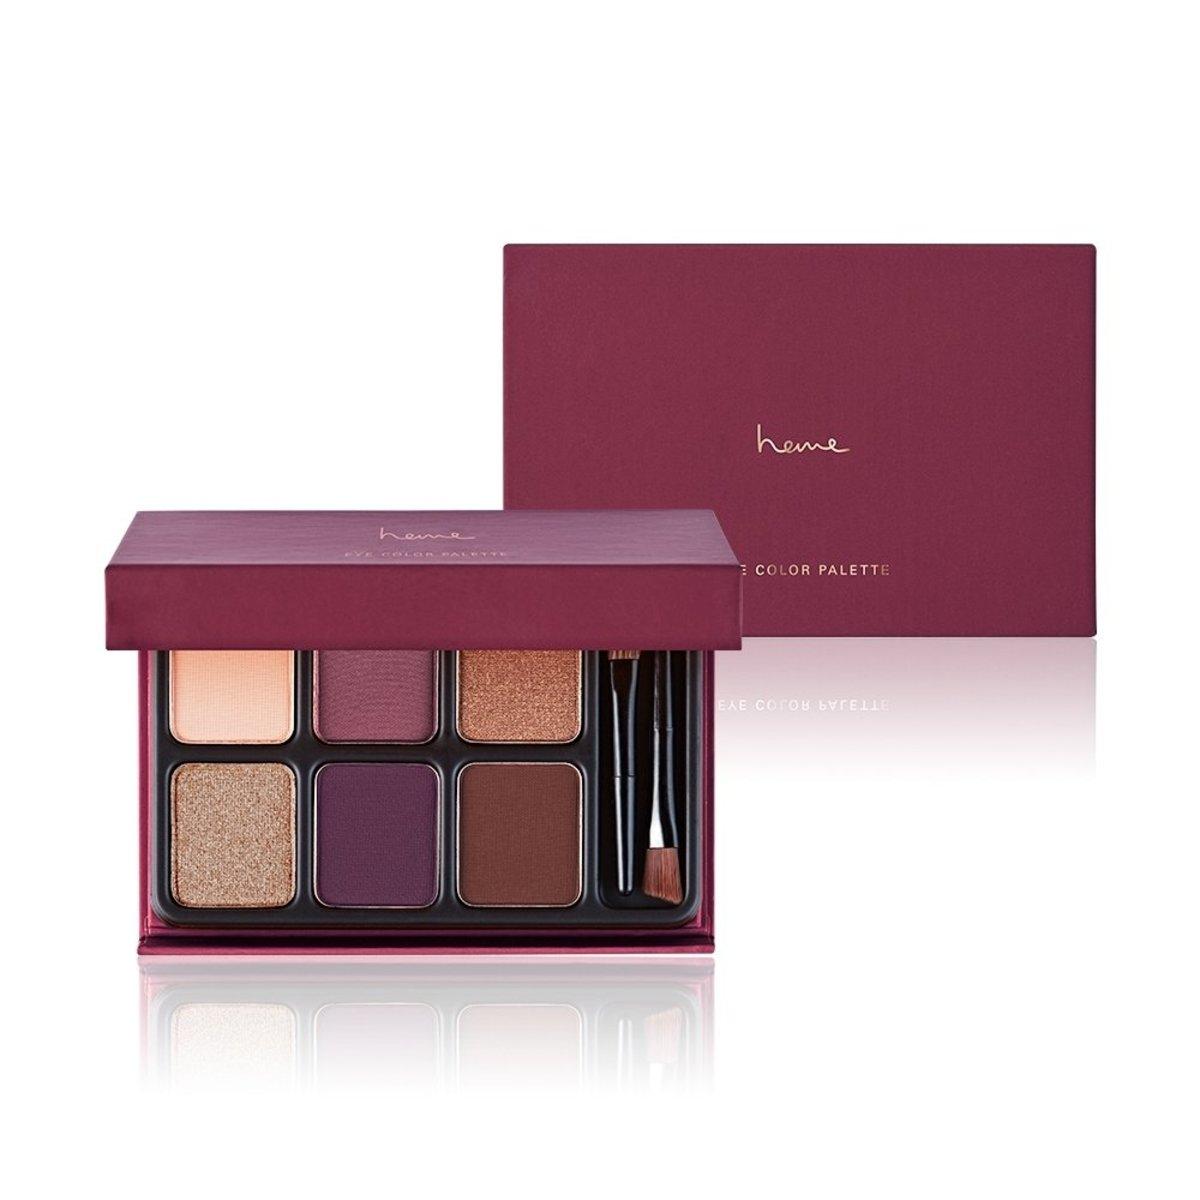 Eye Color Palette  9g (Purple Blossom) (4710704768026)